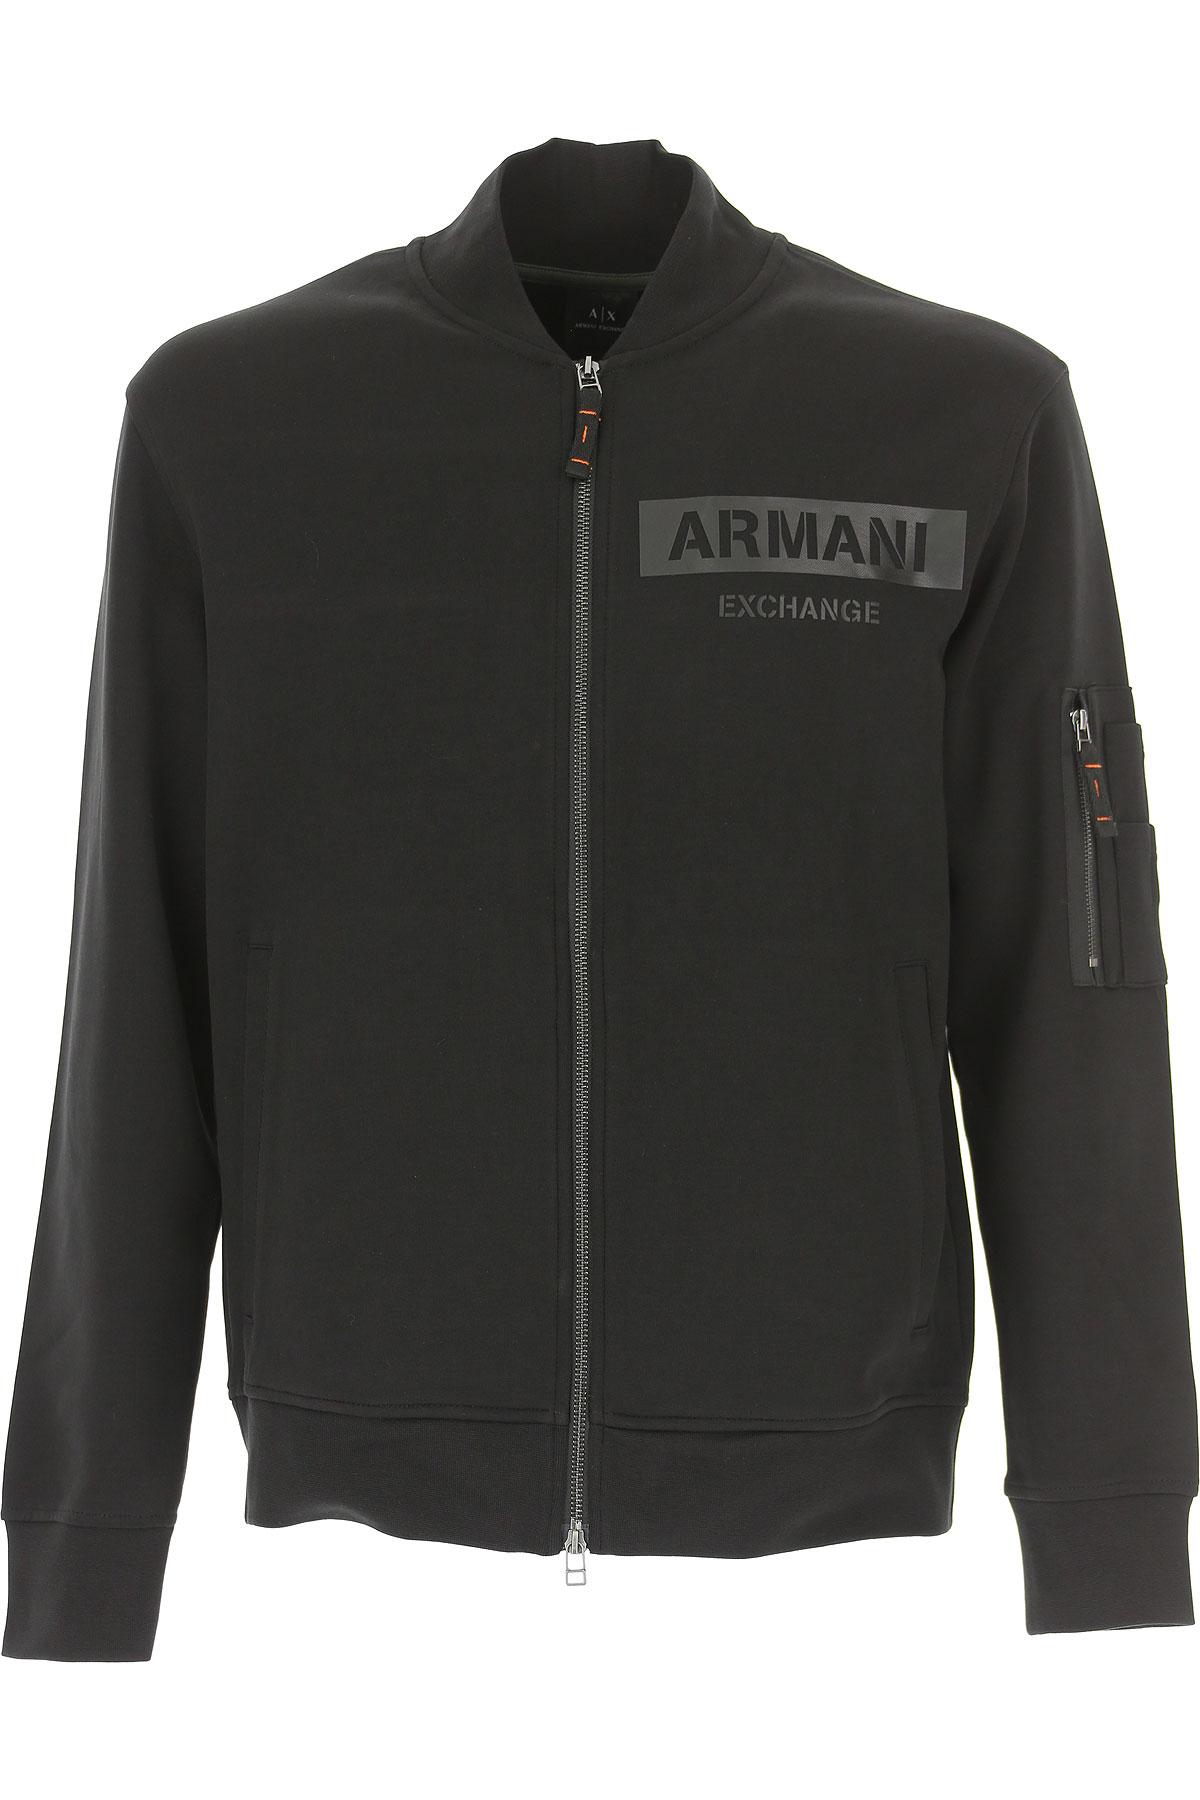 Emporio Armani Sweatshirt for Men, Black, Cotton, 2017, L M S XL USA-472333